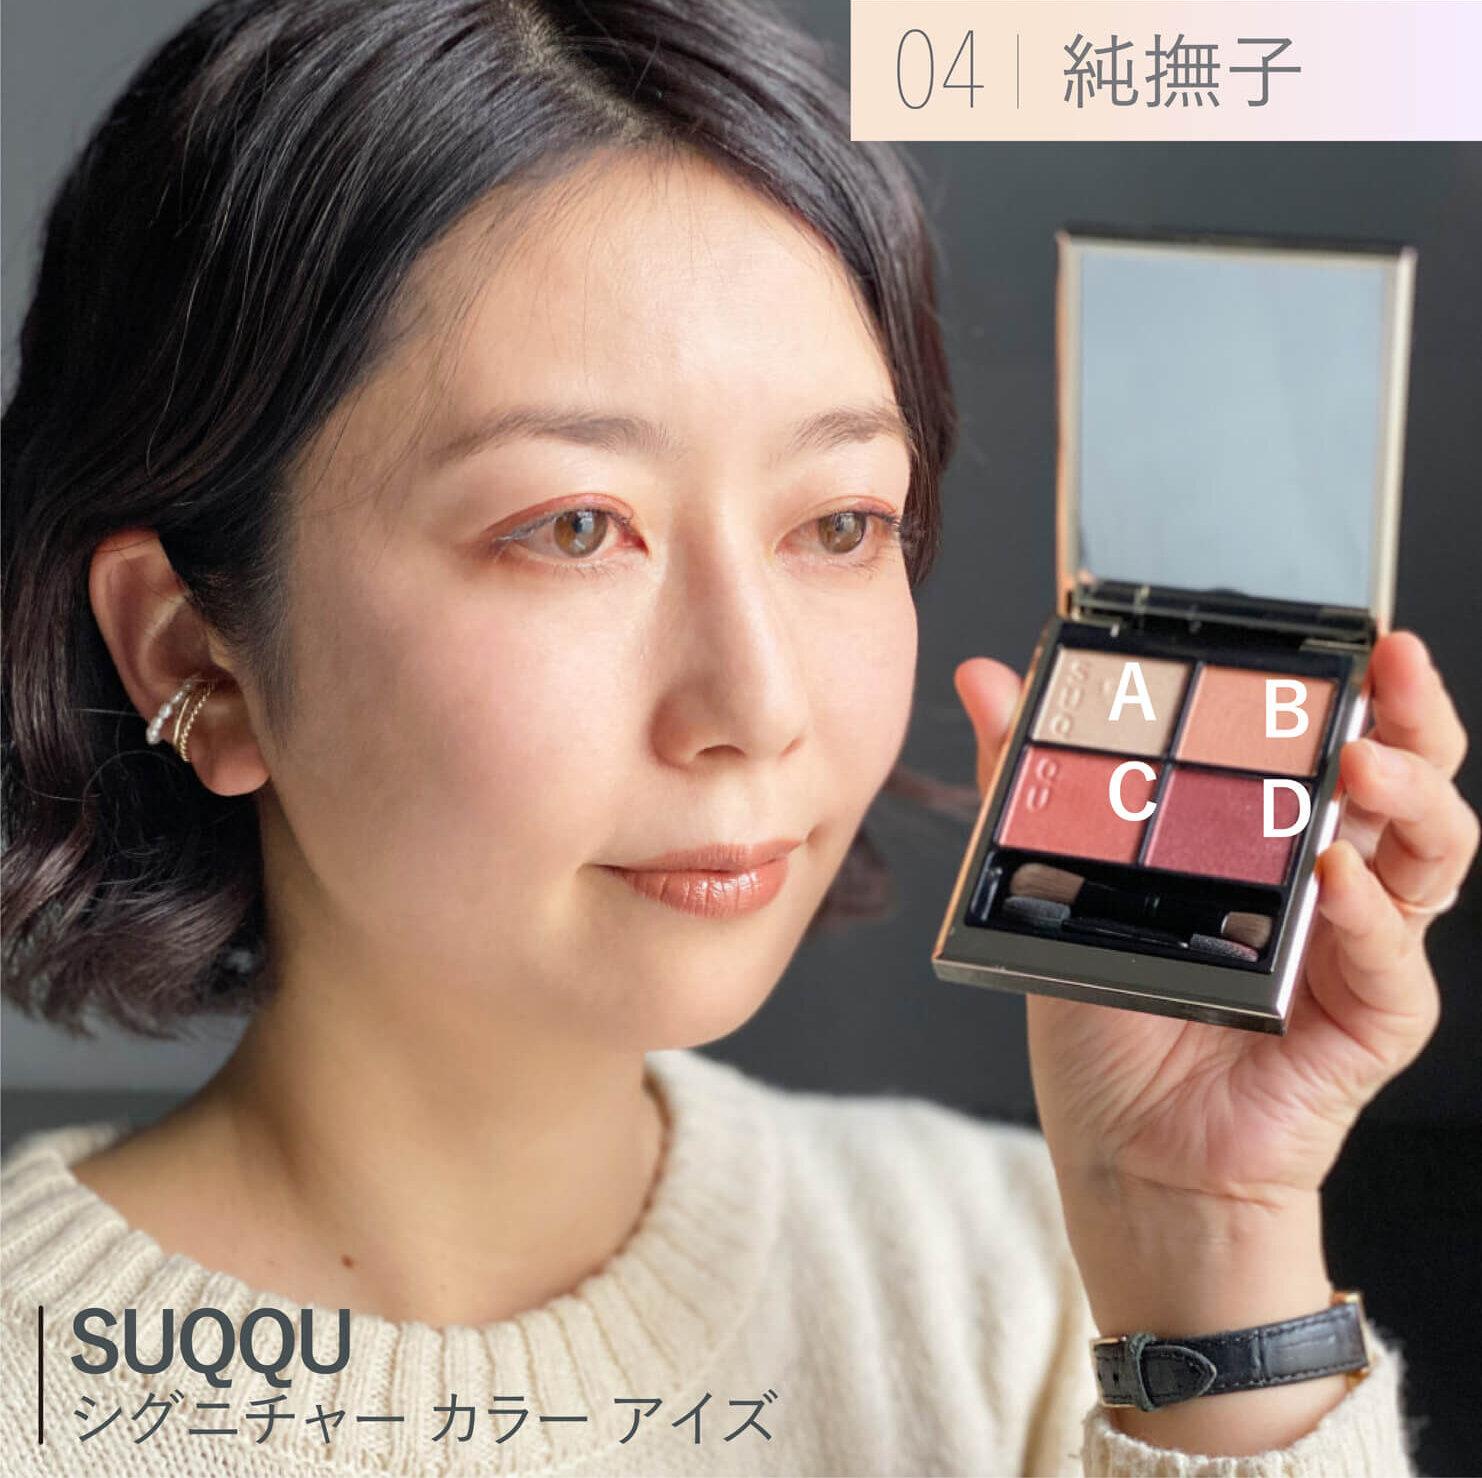 SUQQU シグニチャー カラー アイズ 【04 純撫子】をお試し